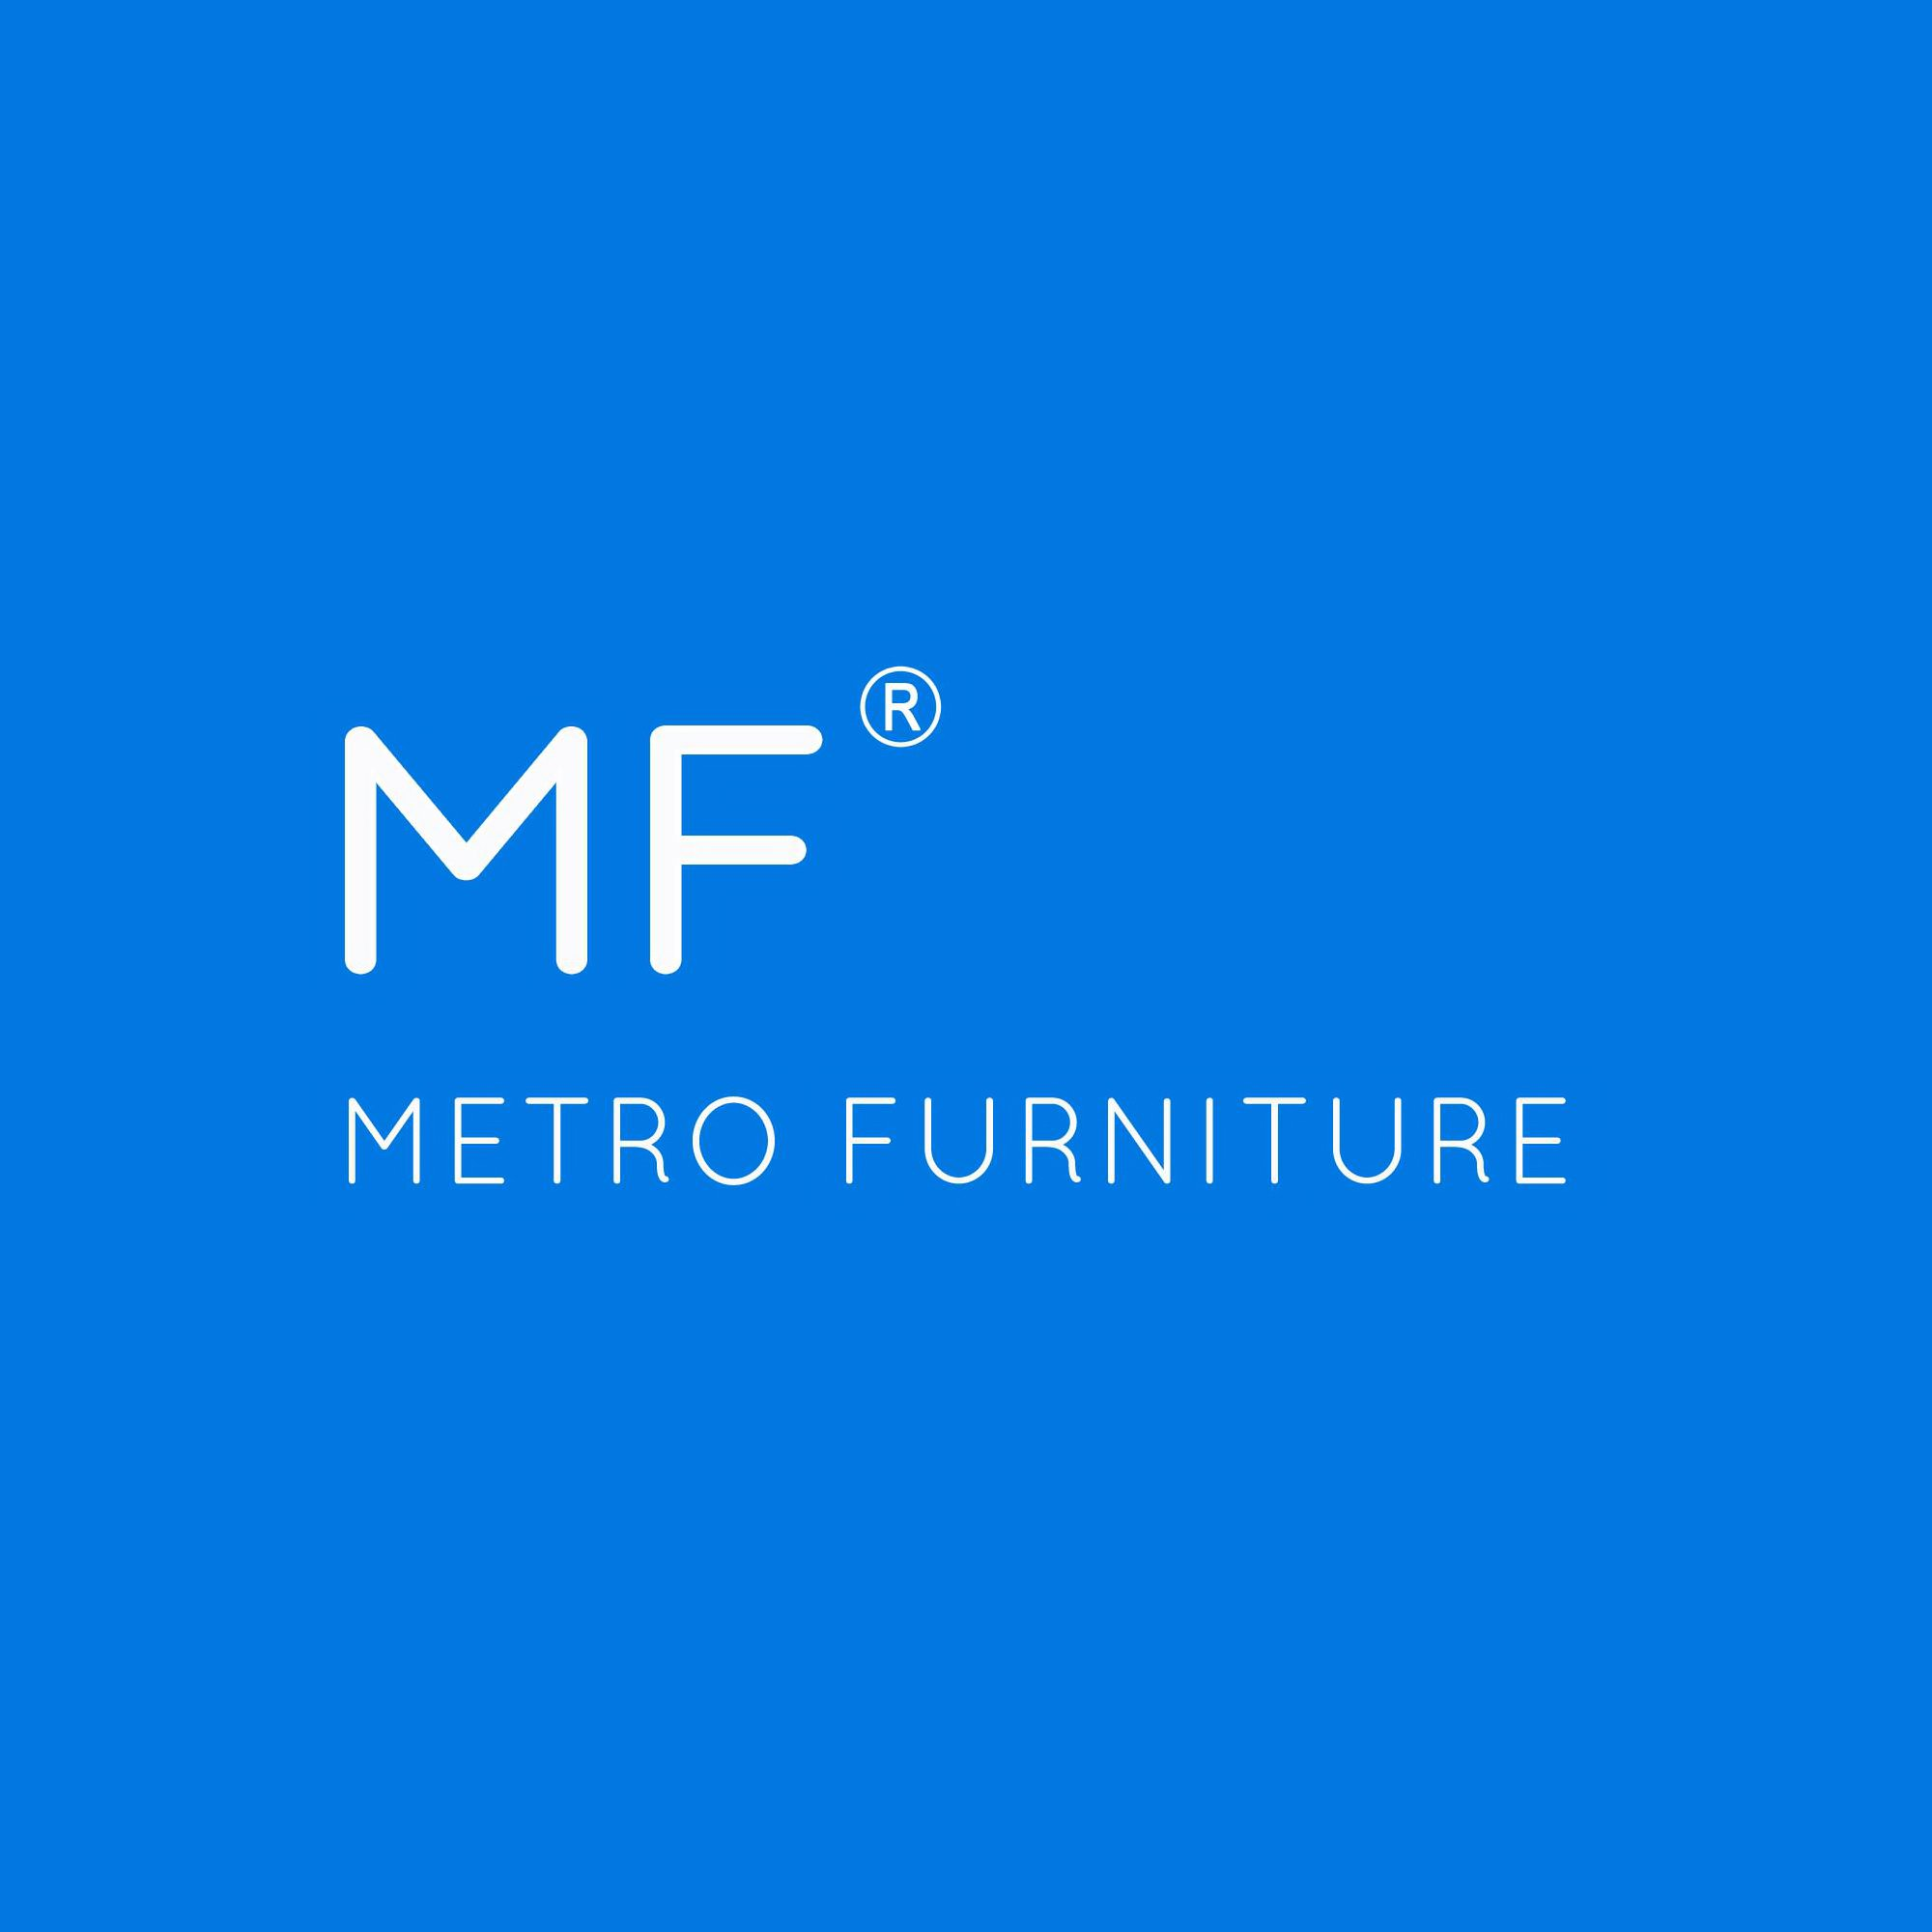 Trademark Logo STYLIZED MF WITH METROFURNITURE